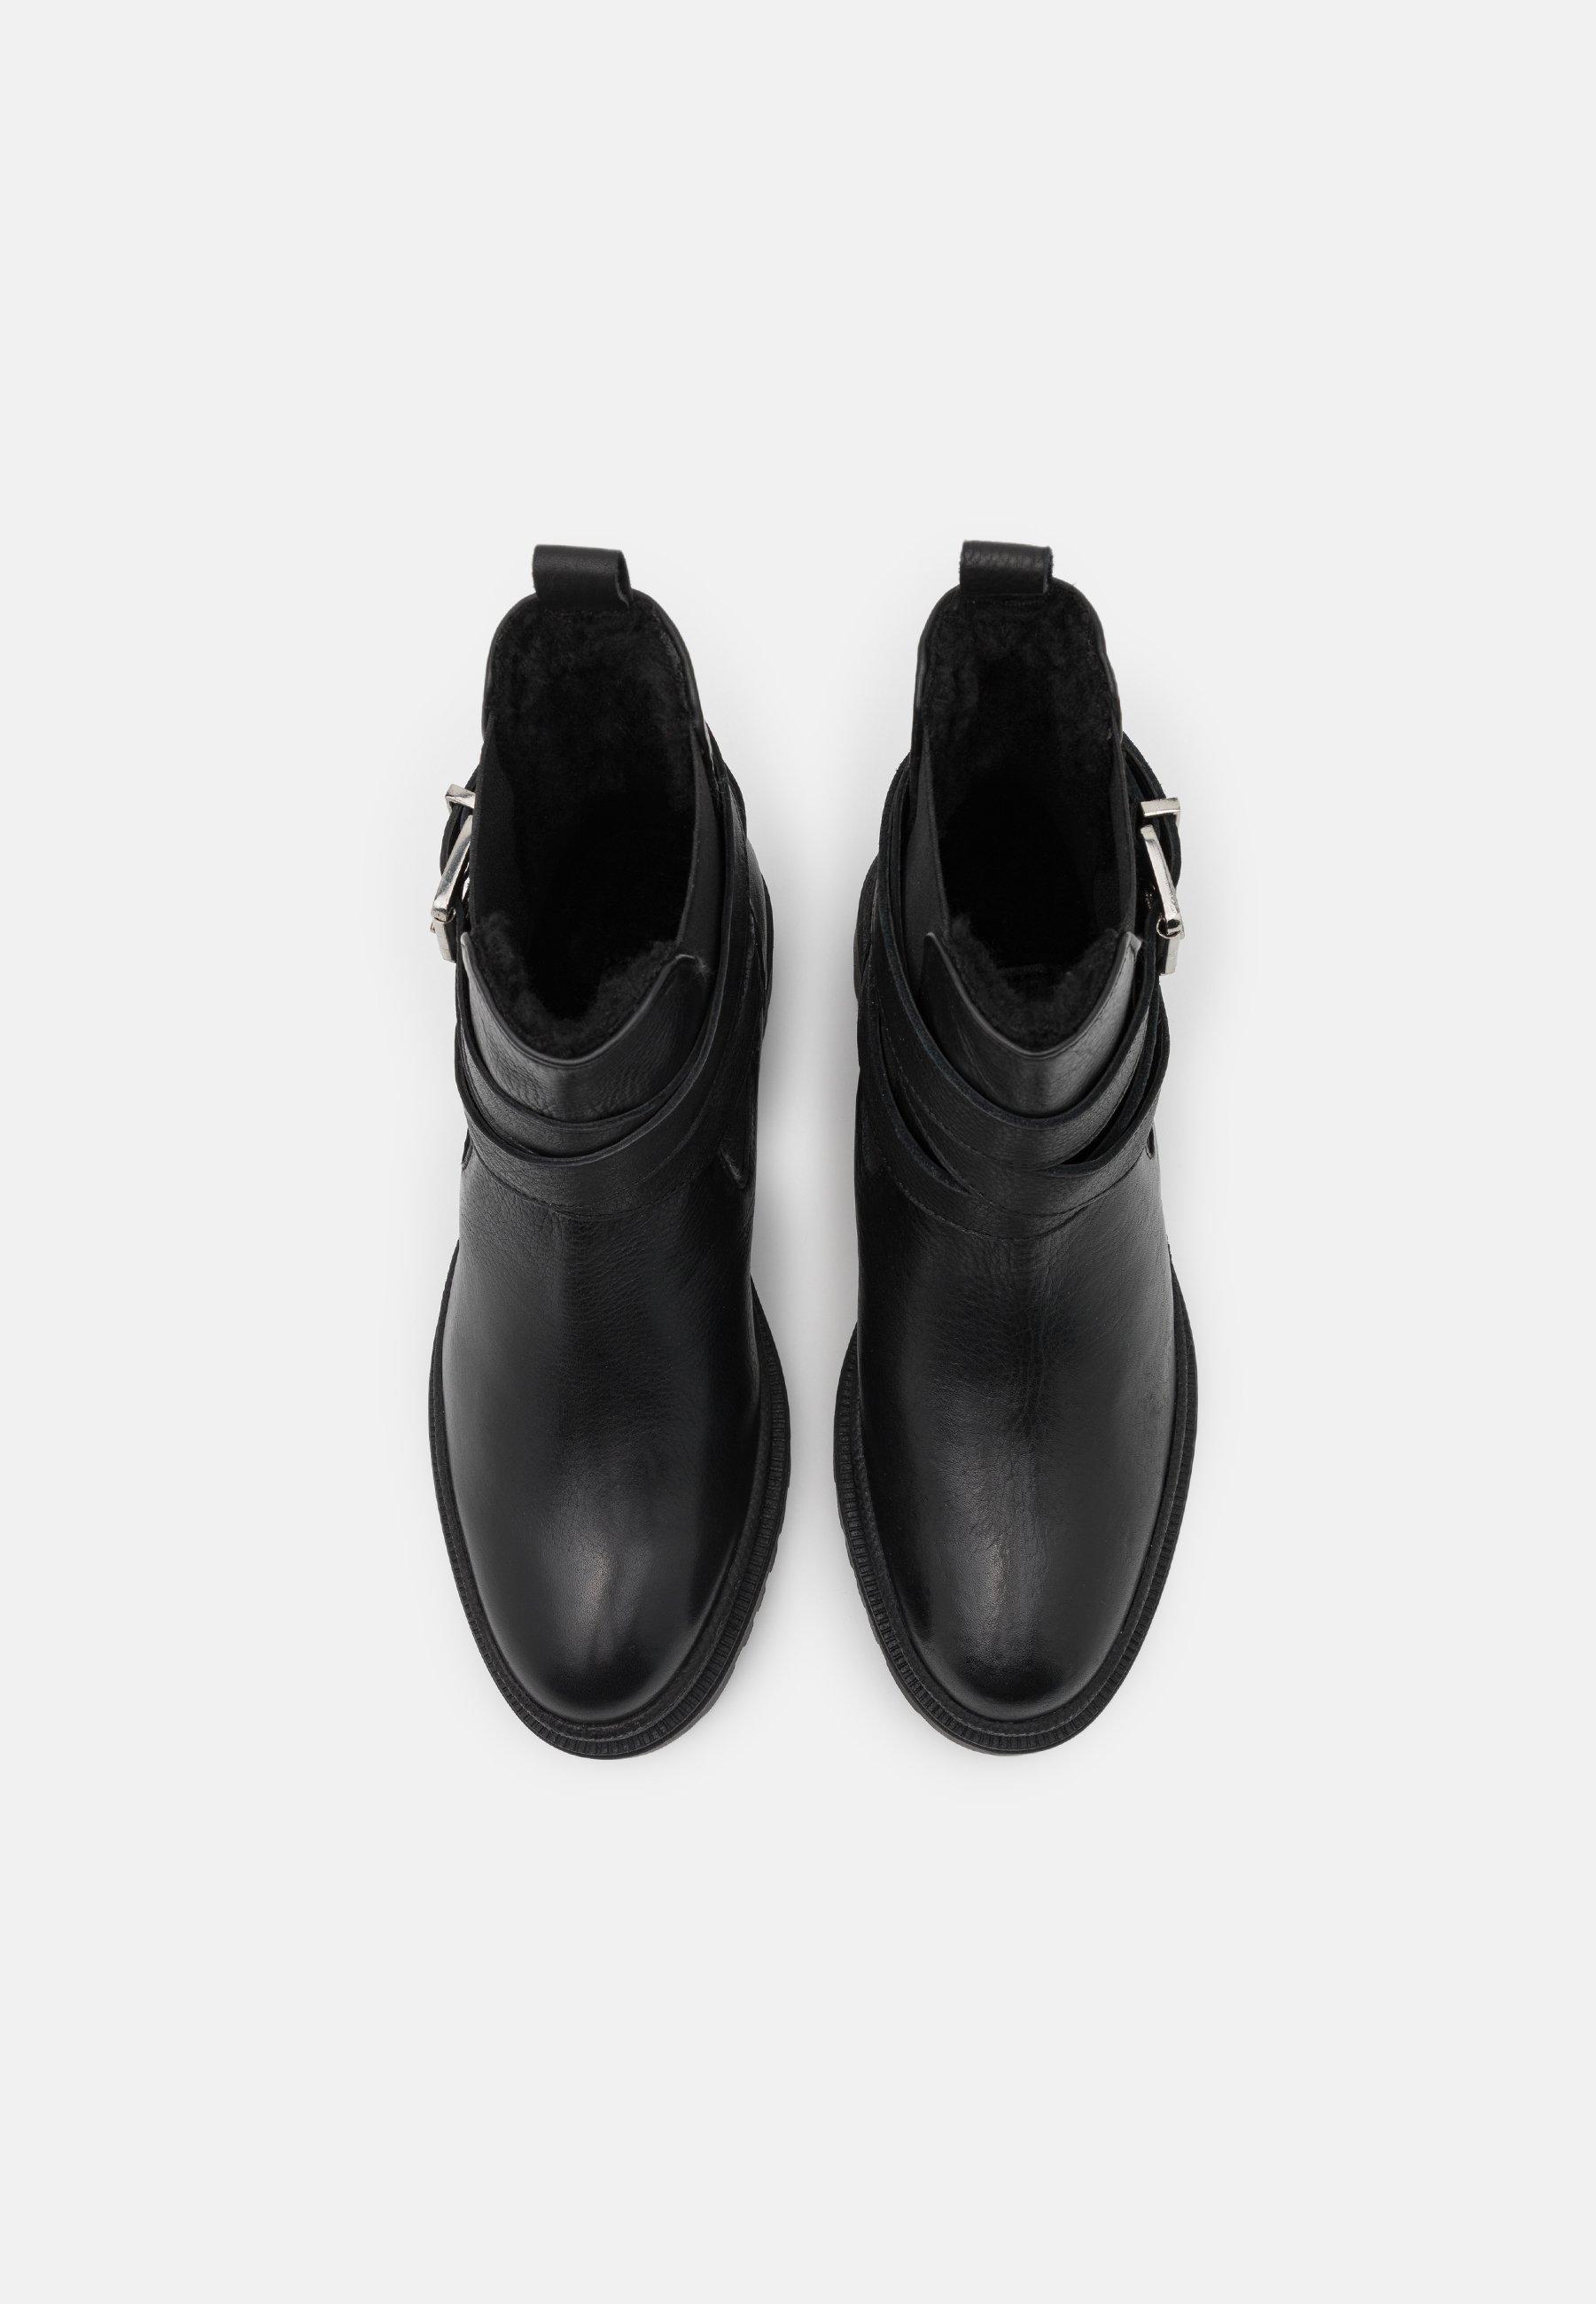 Zign Plateaustiefelette black/schwarz